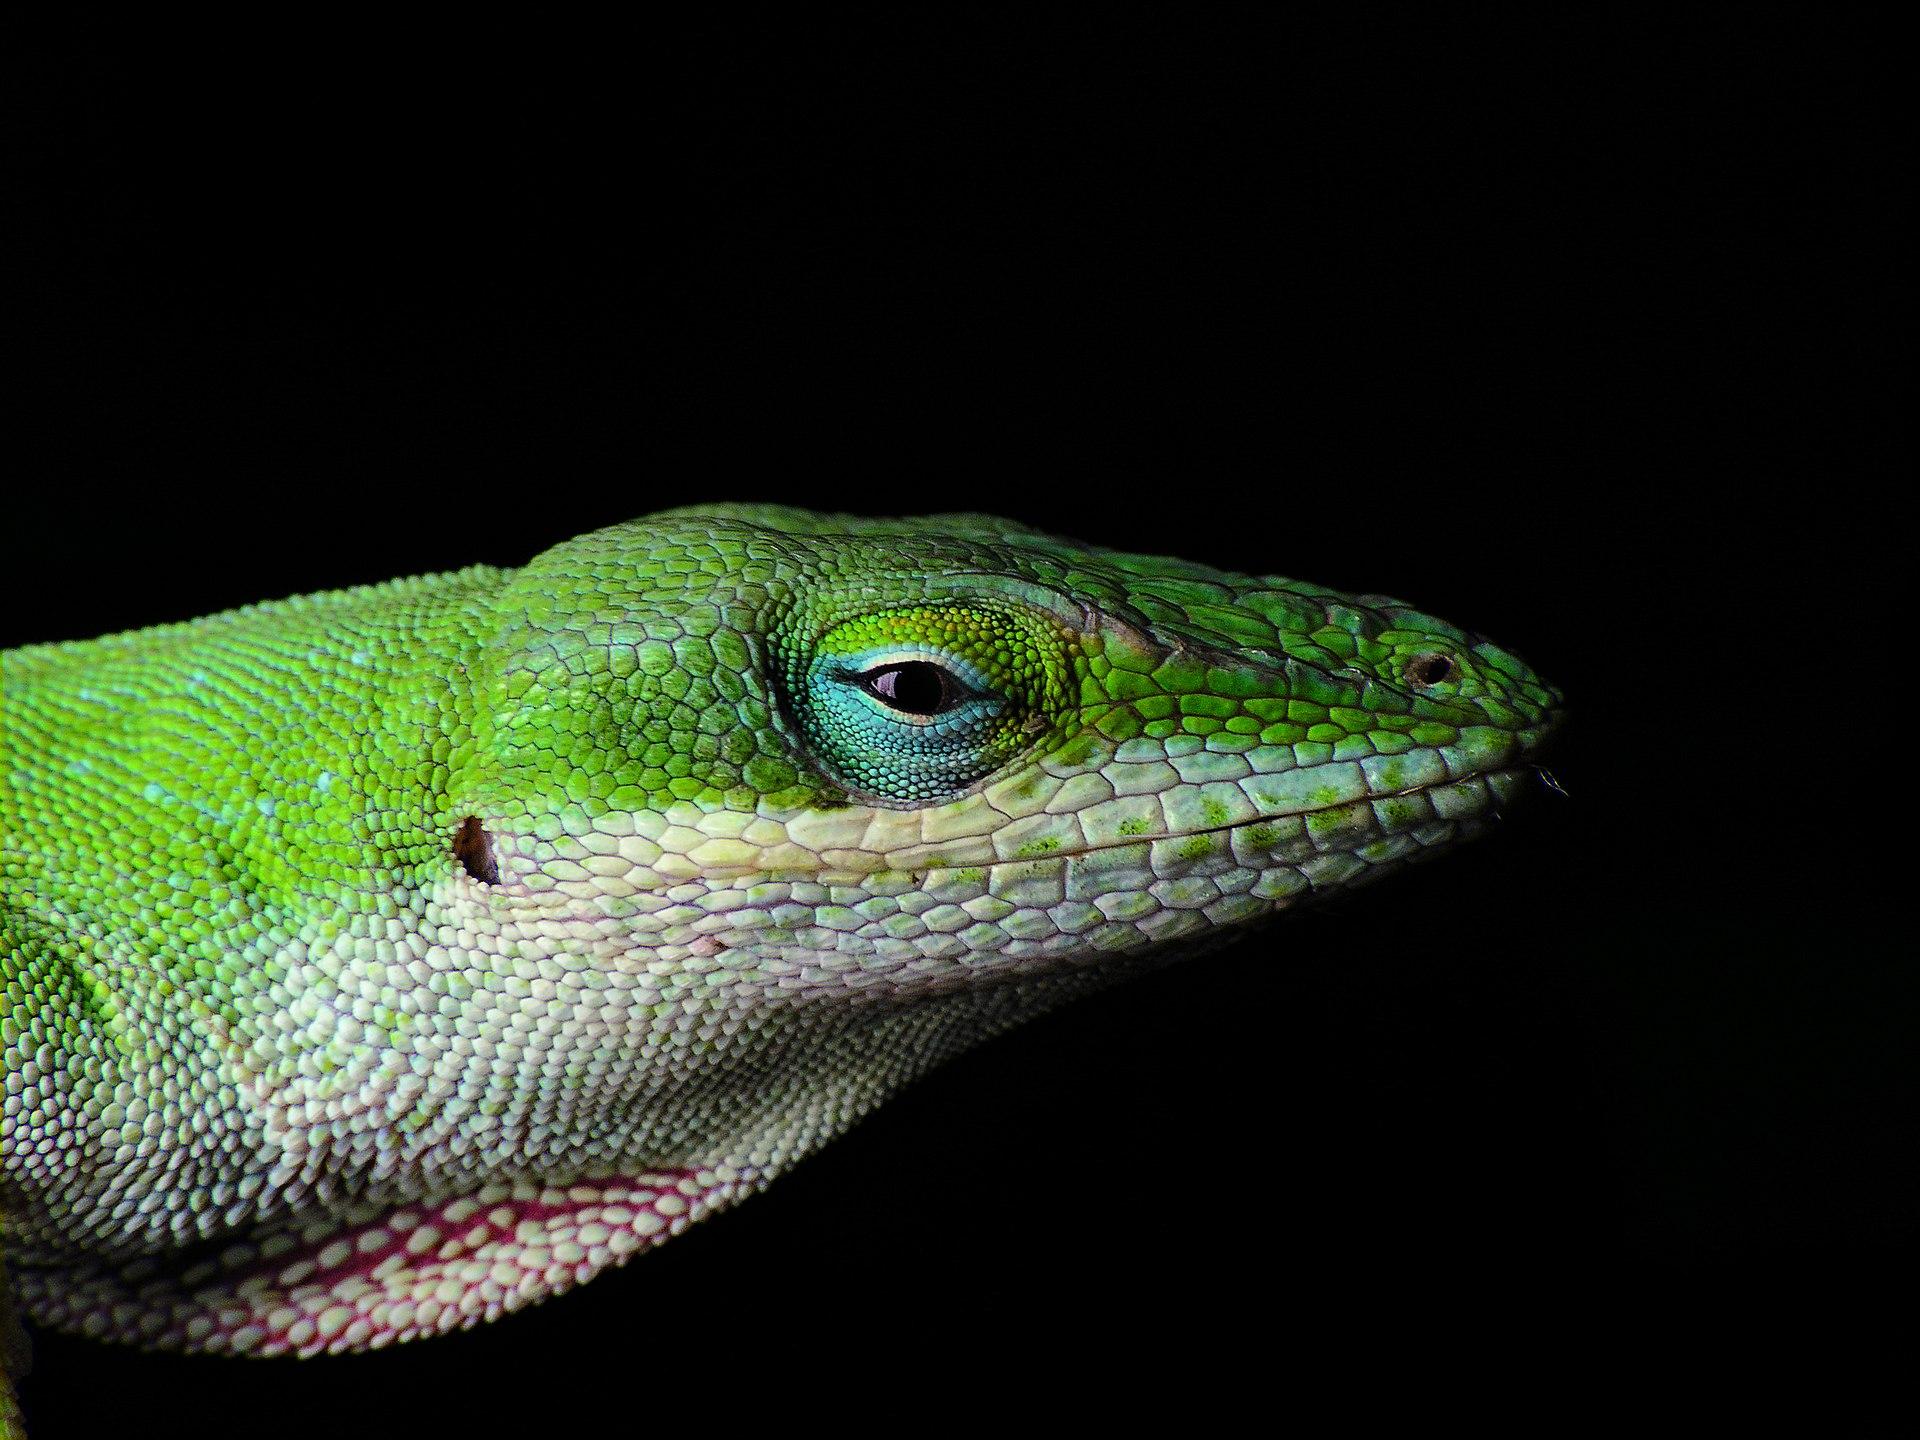 Lizard In My Backyard lizard in my backyard – dollybhargava image